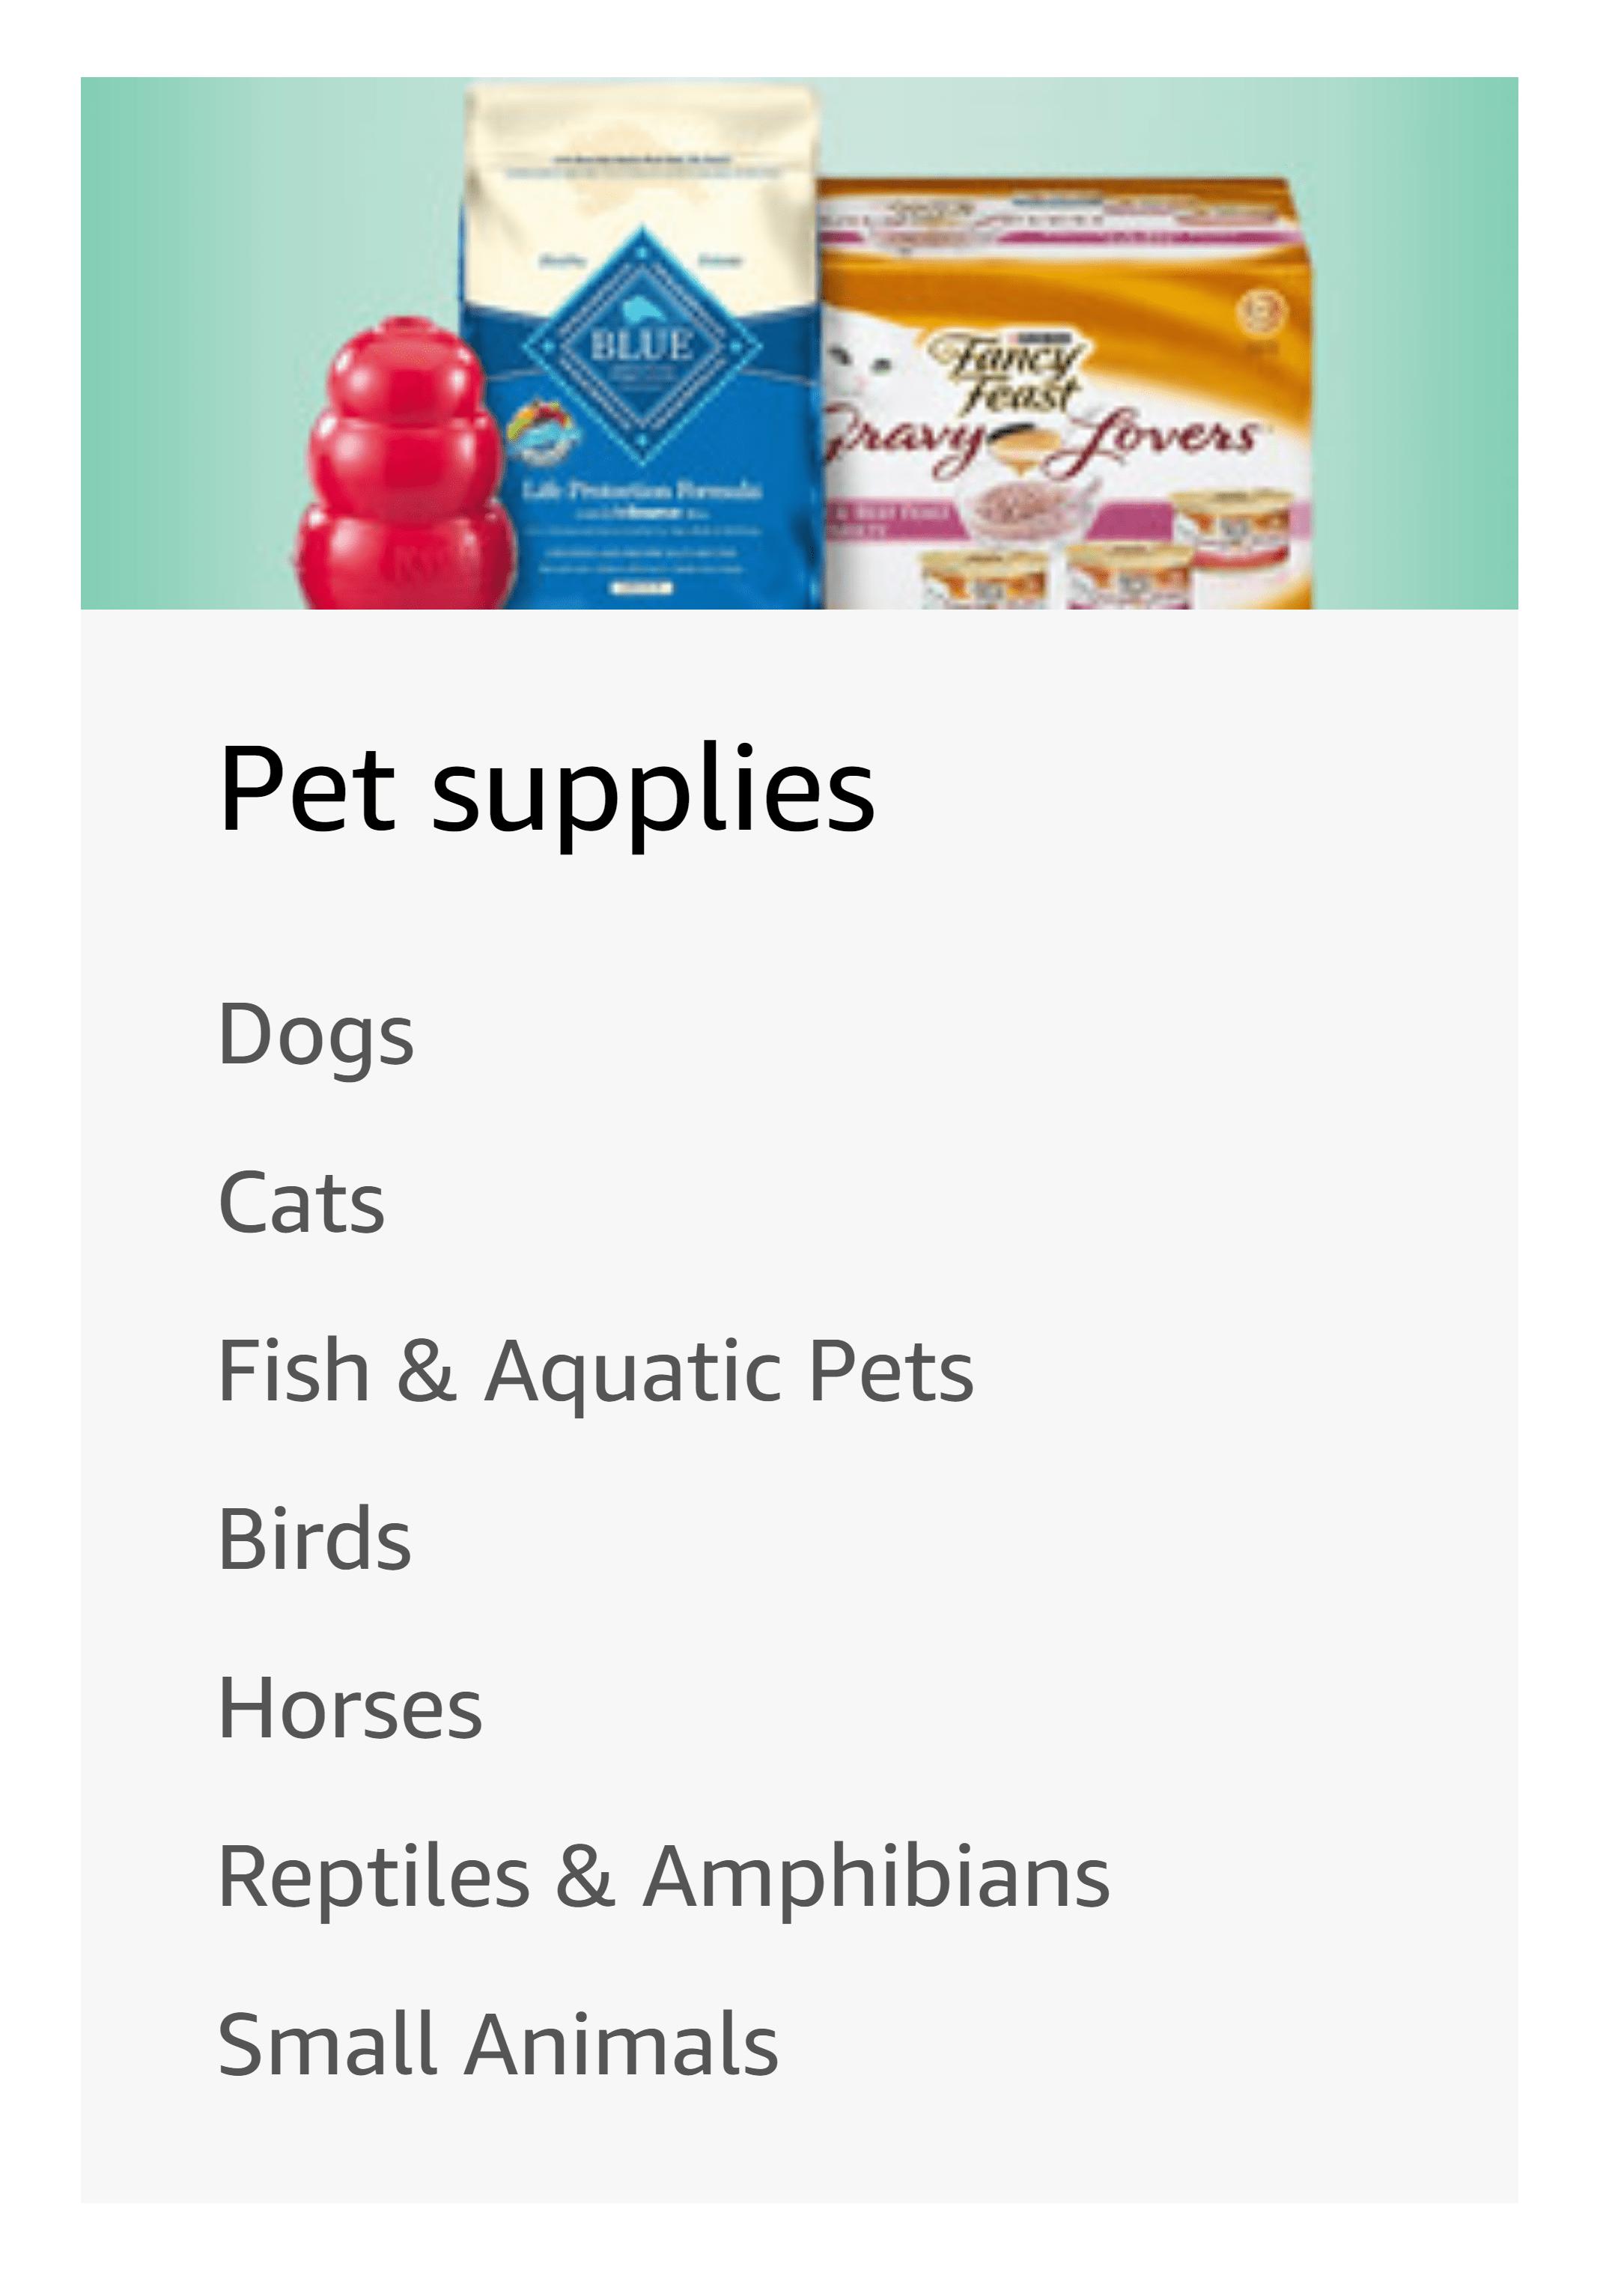 Amazon pet supplies category